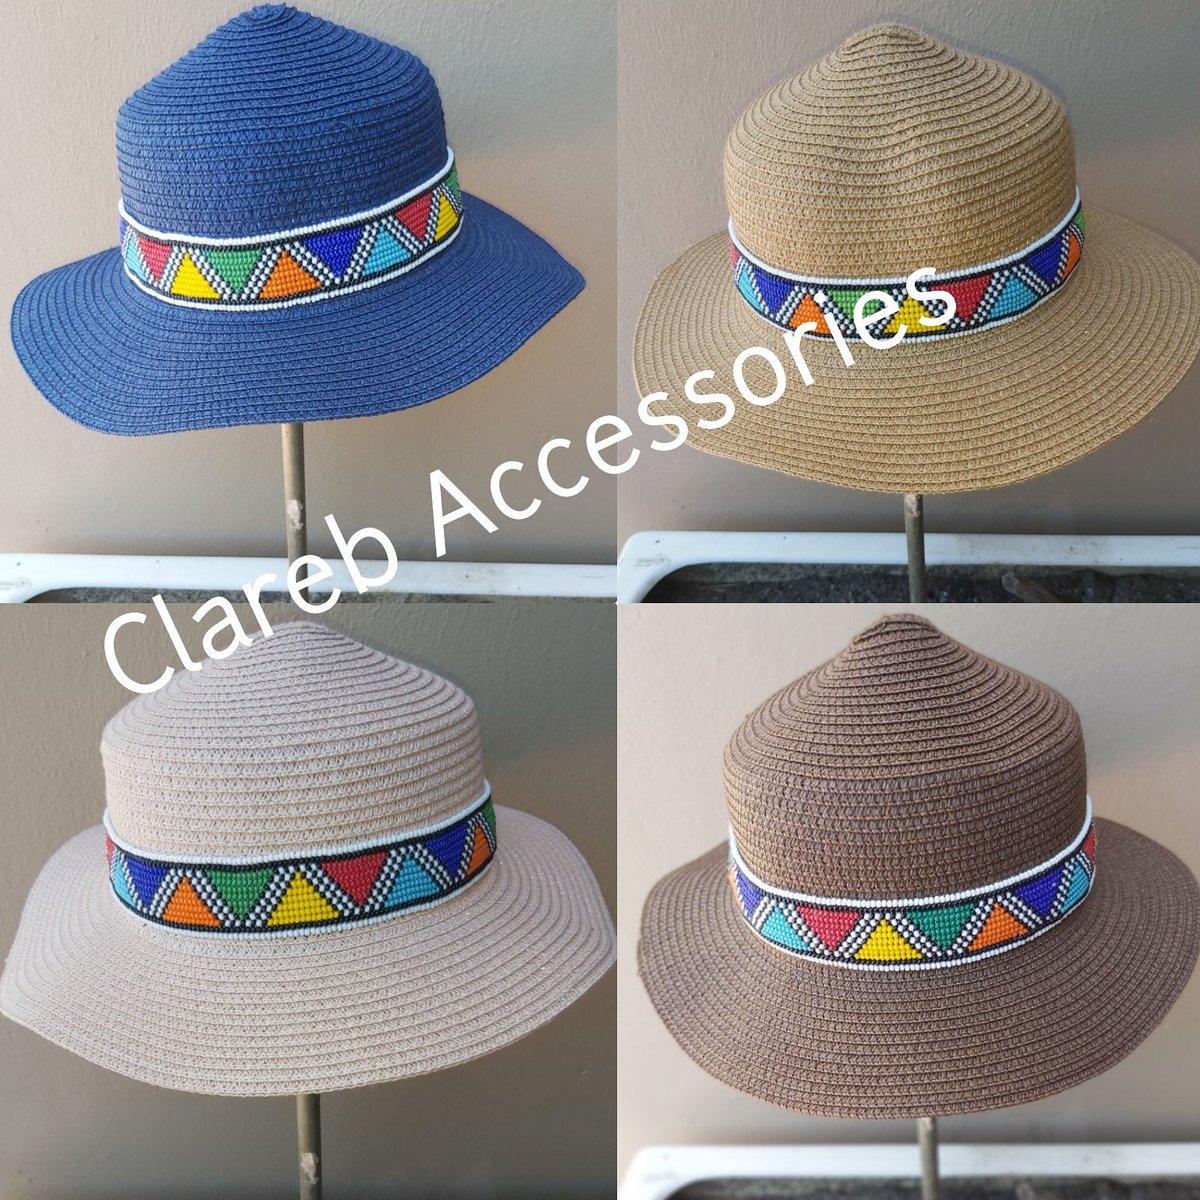 #summerfashion2019 #summerhats  #hats #beadedhats #handmadejewelry  #art #craft #creativity #buylocal #createjobs  #shoplocal #womeinbusiness #womenfashion #womenempowermentpic.twitter.com/SBn1lqCdEy